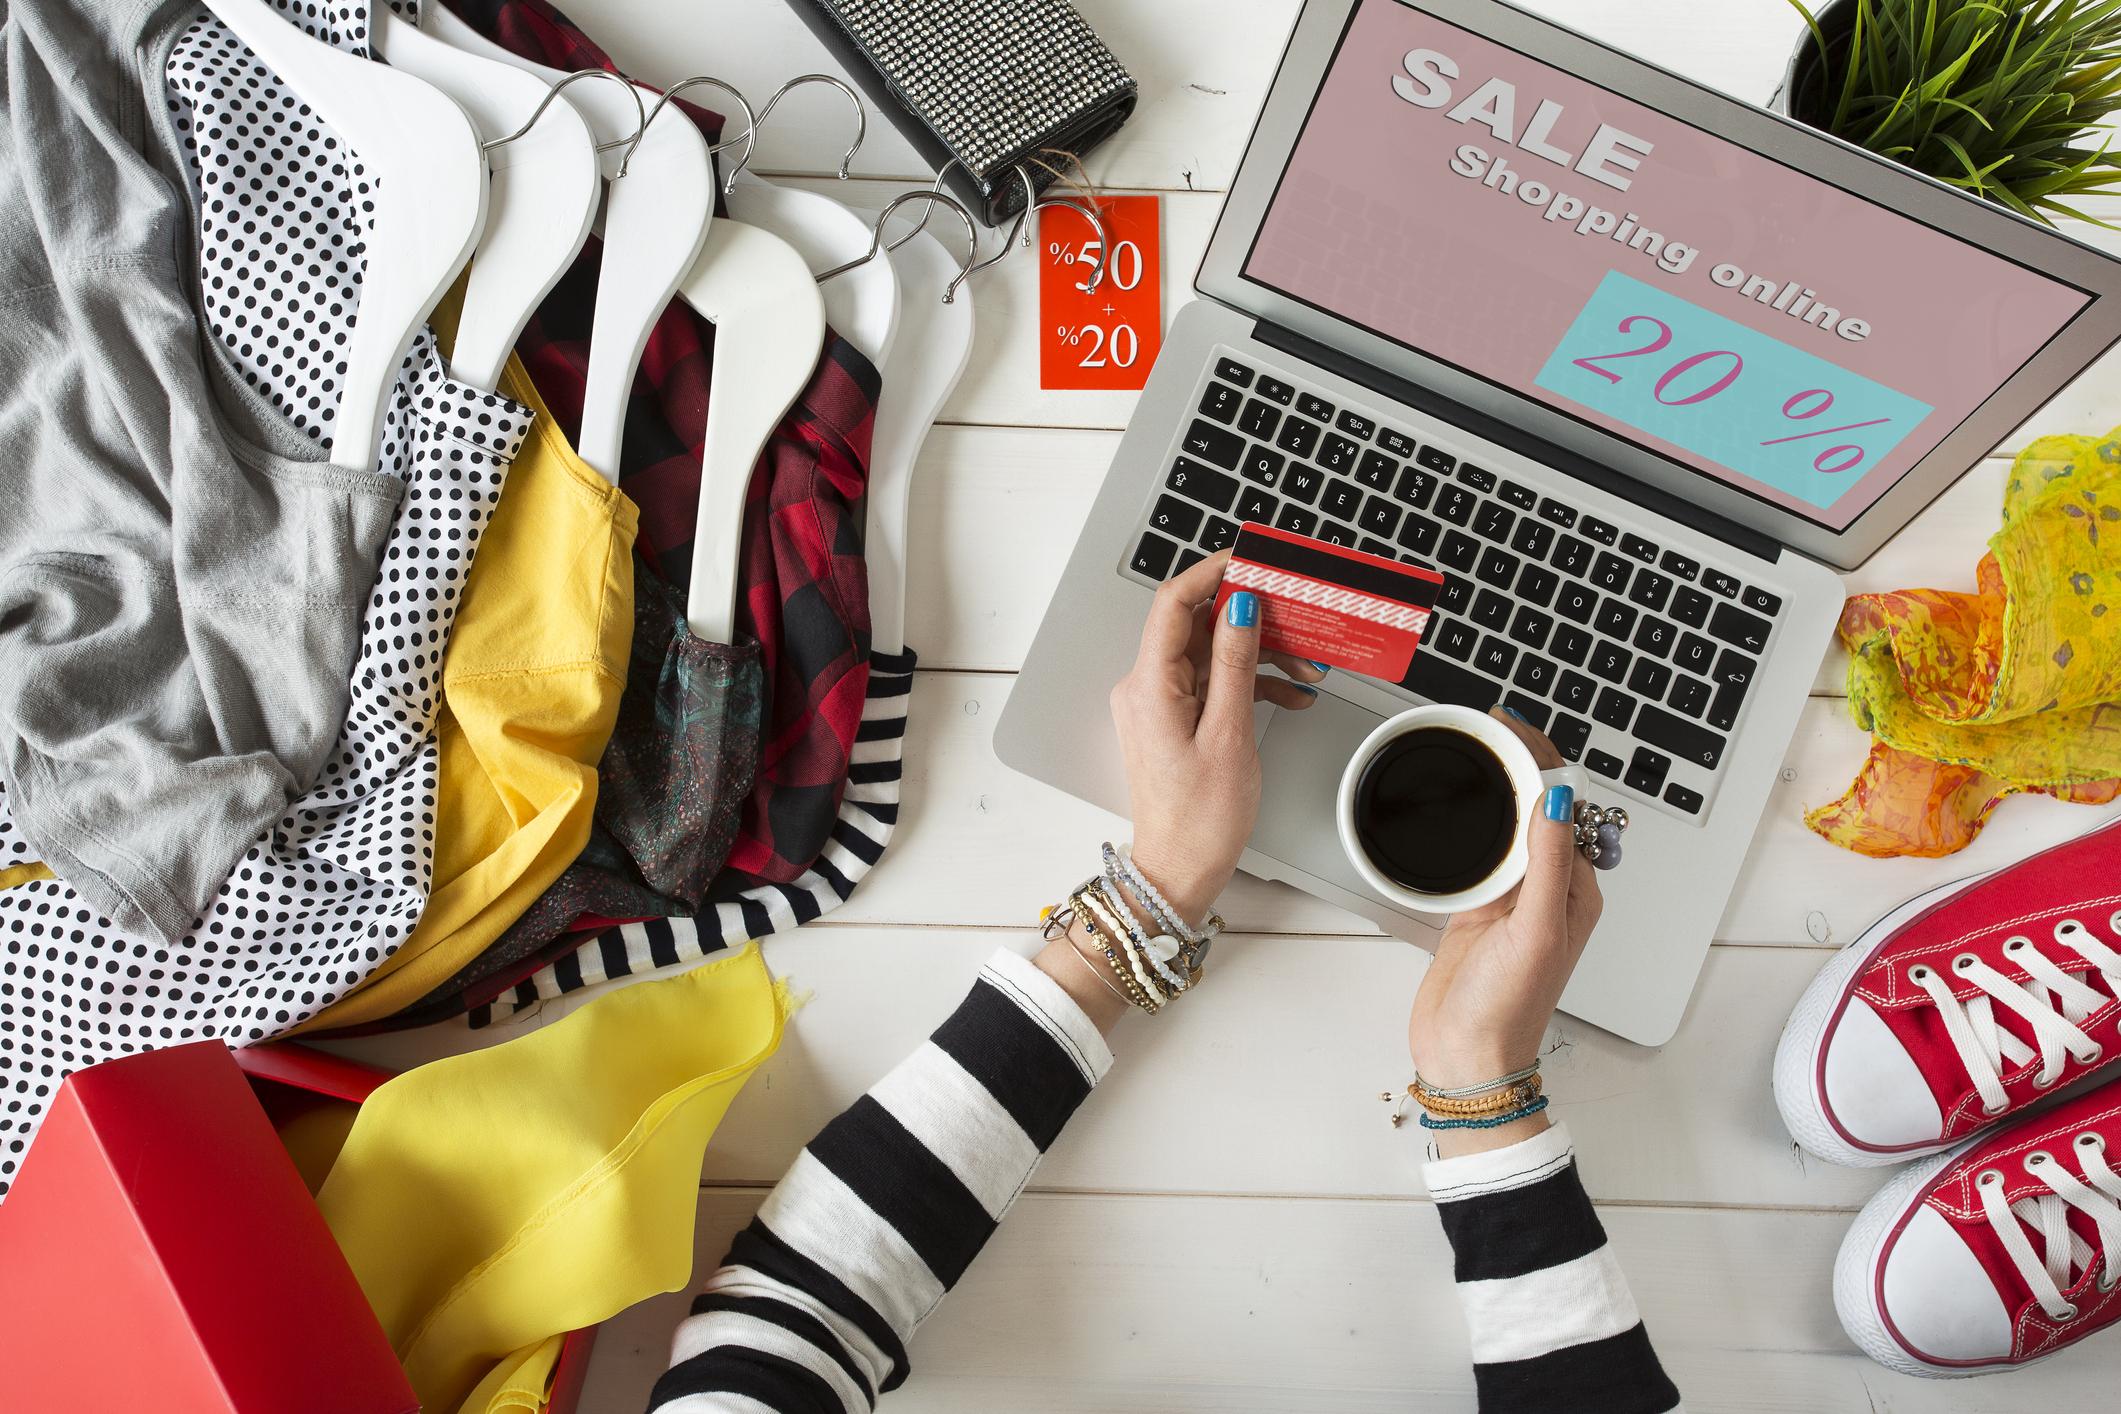 Black Friday Sales Deals 2020 Everything We Know So Far Cnn Underscored